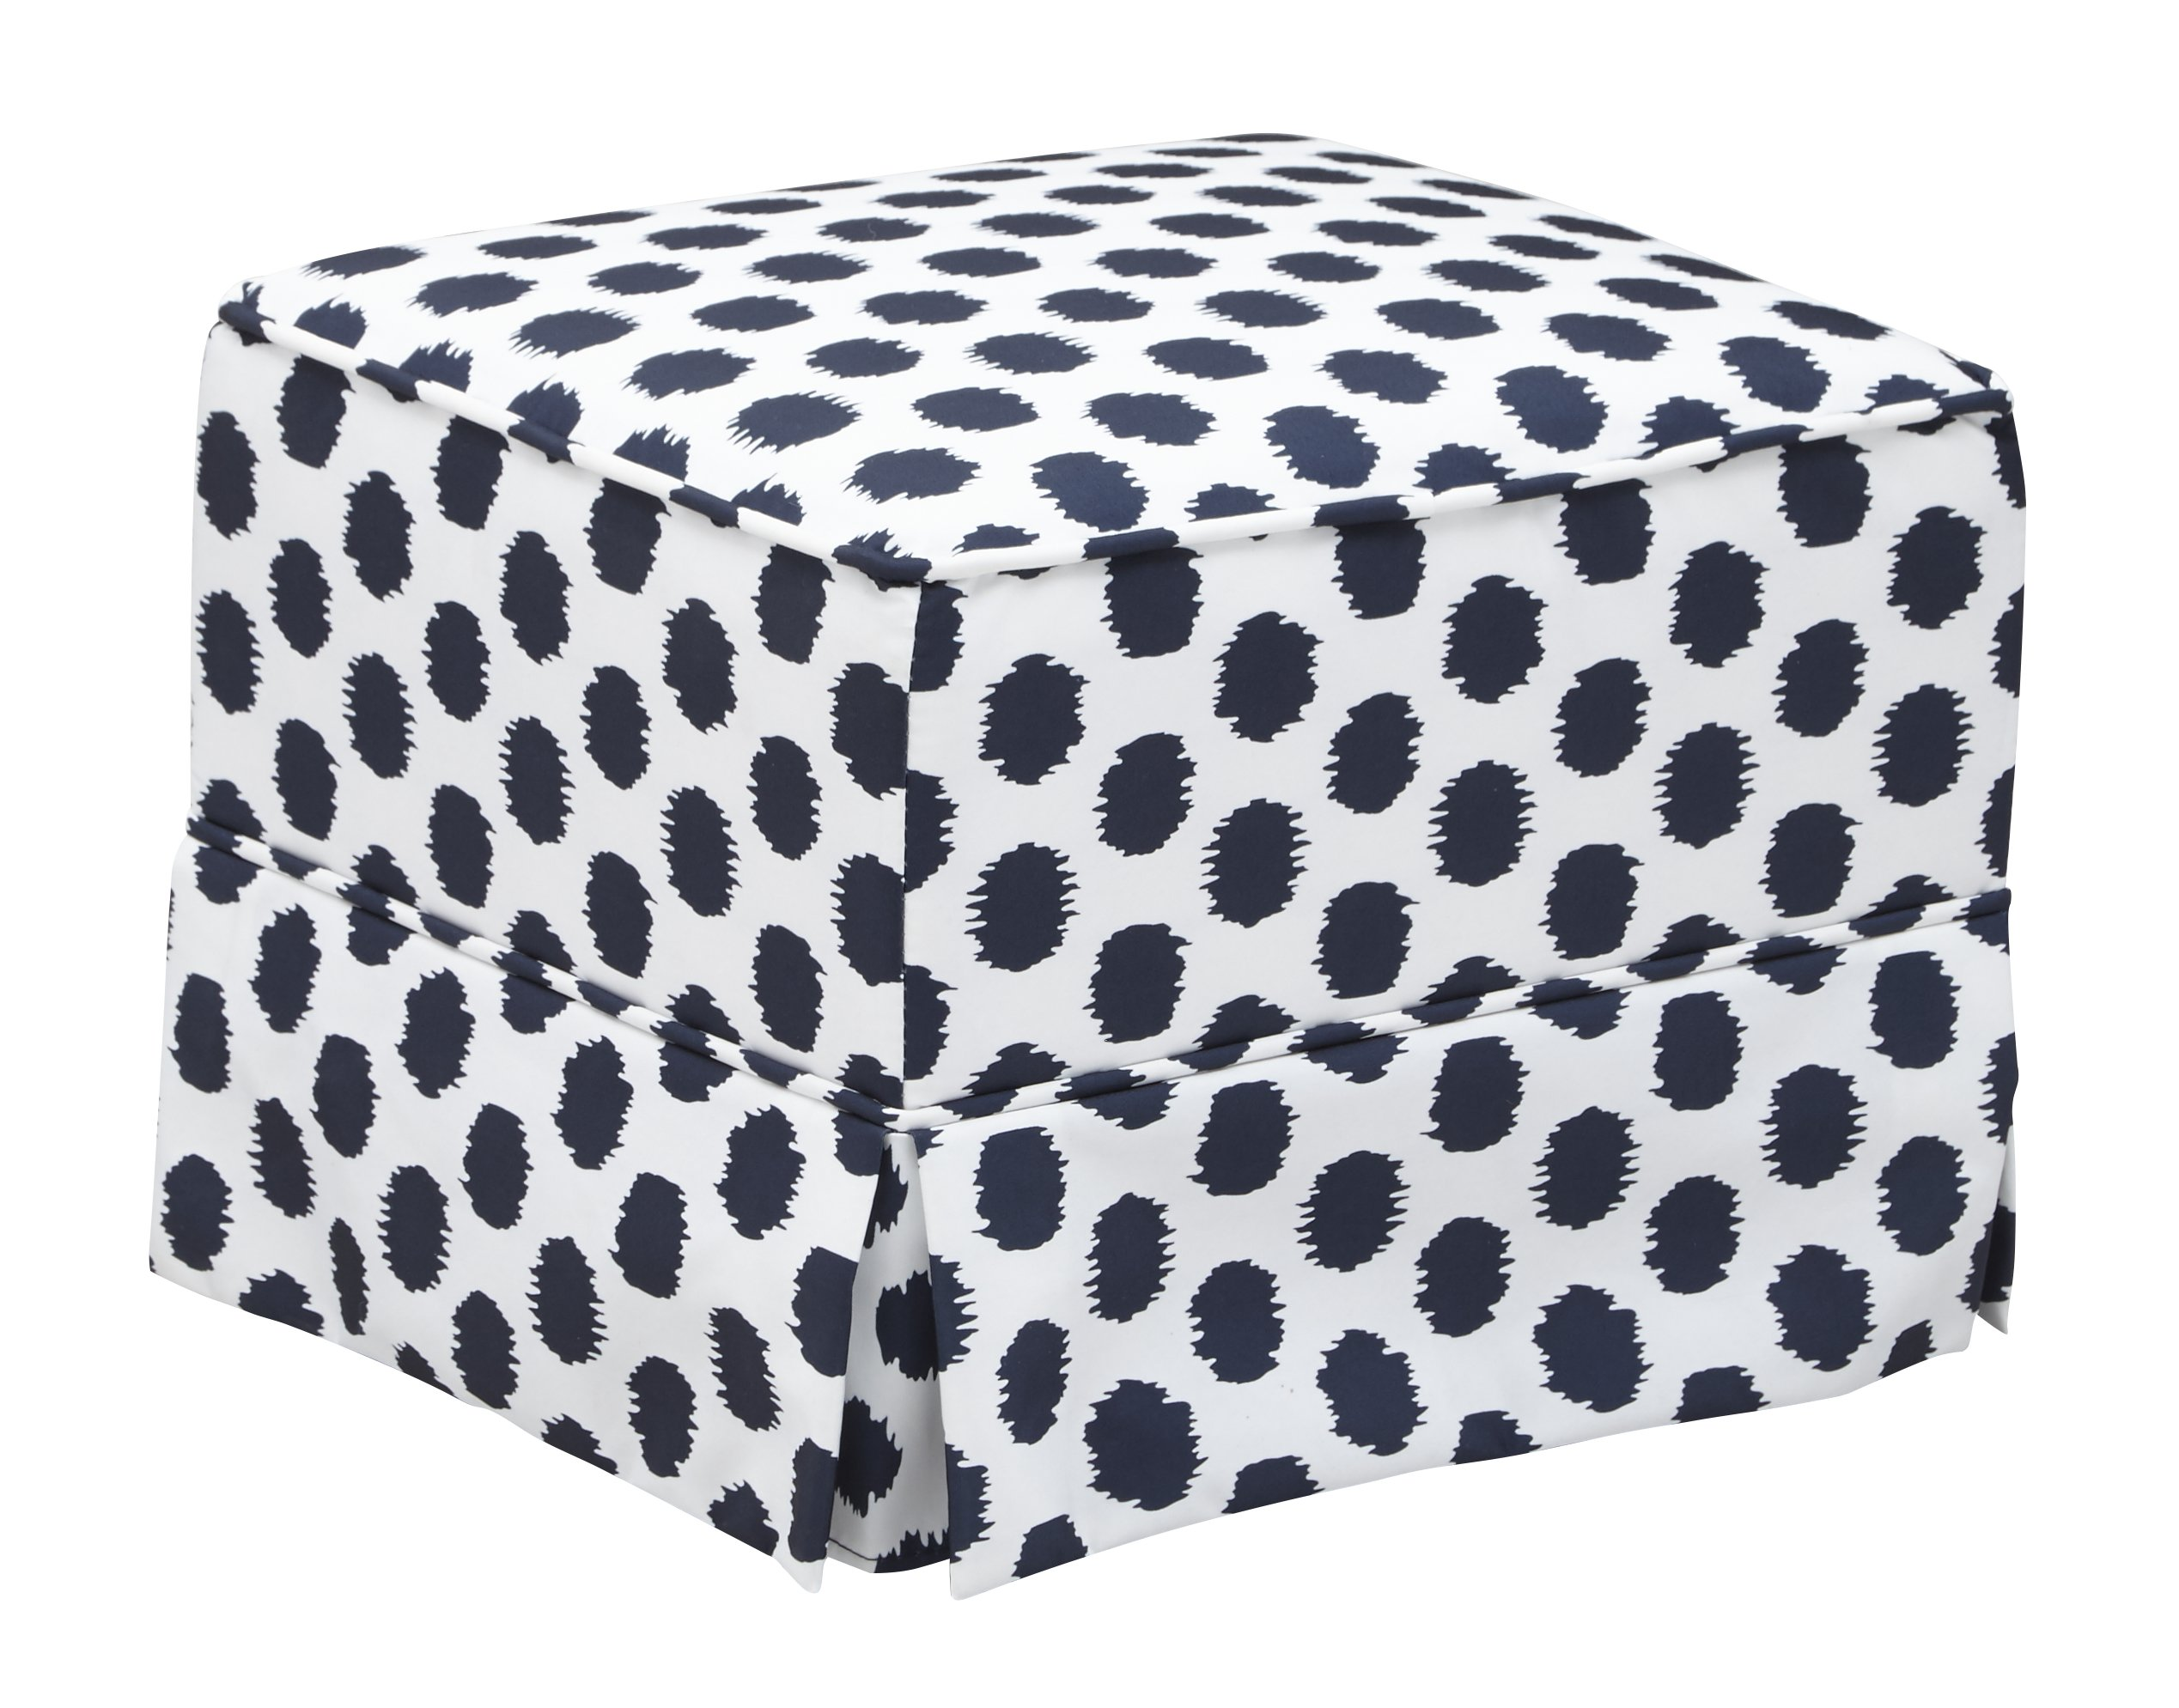 Storkcraft Polka Dot Upholstered Ottoman, White/Navy, Cleanable Upholstered Comfort Rocking Nursery Ottoman by Storkcraft